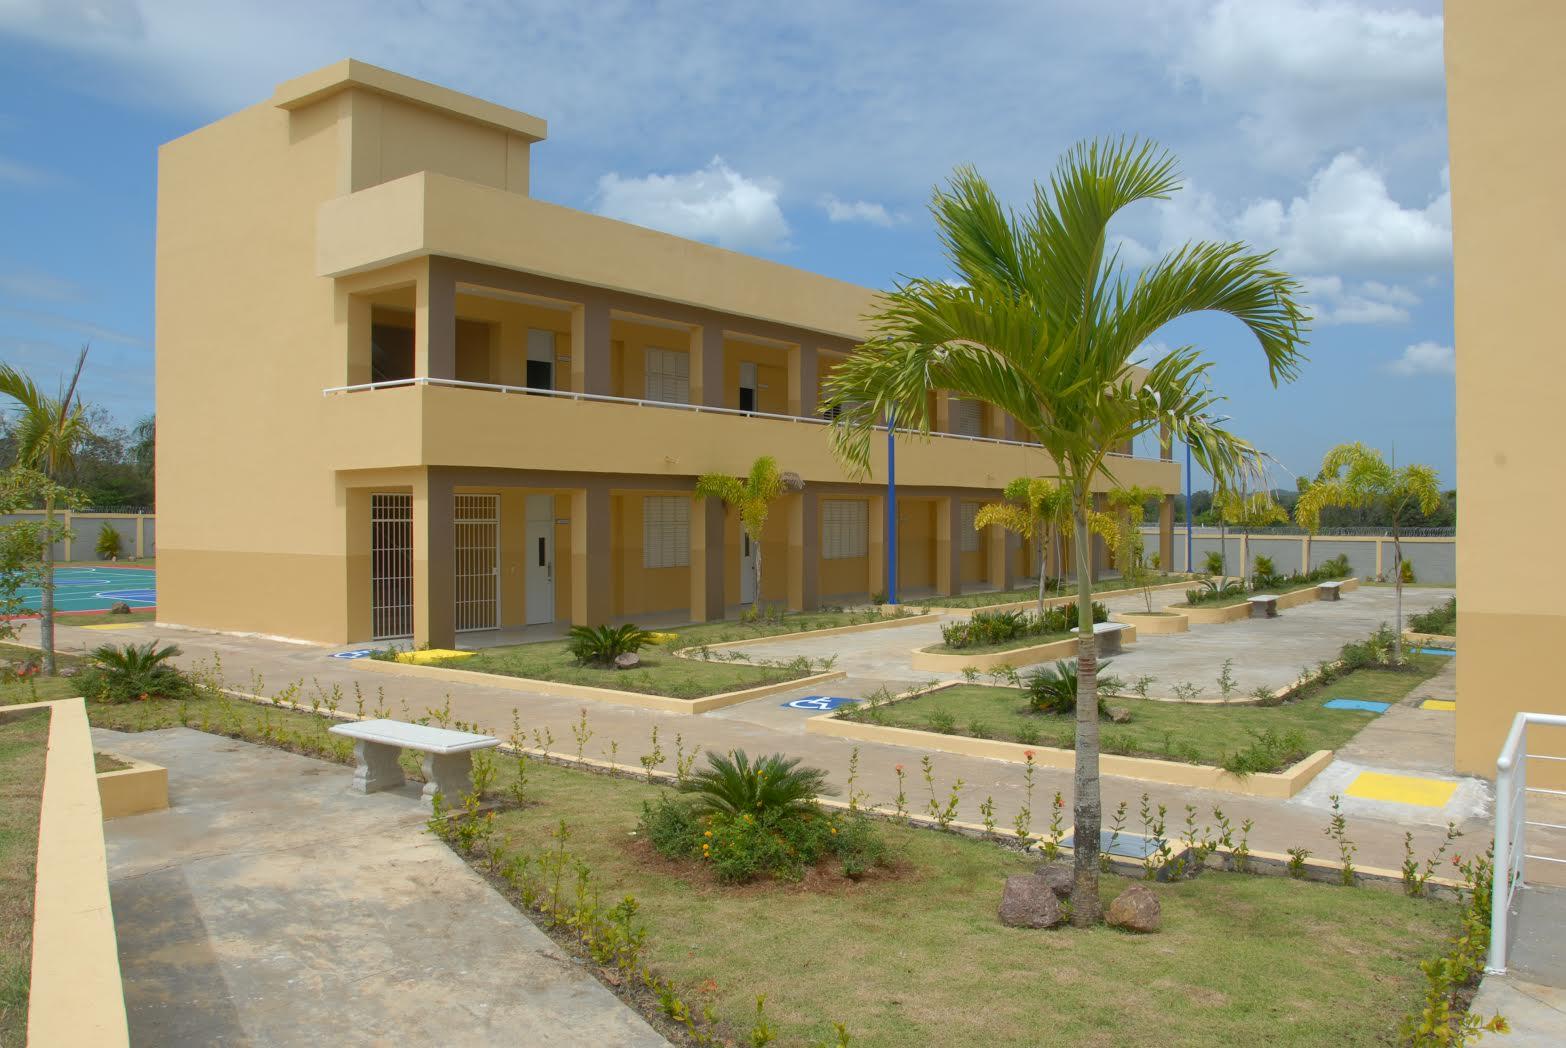 MONTE PLATA: Presidente dominicano entrega tres nuevos liceos secundarios